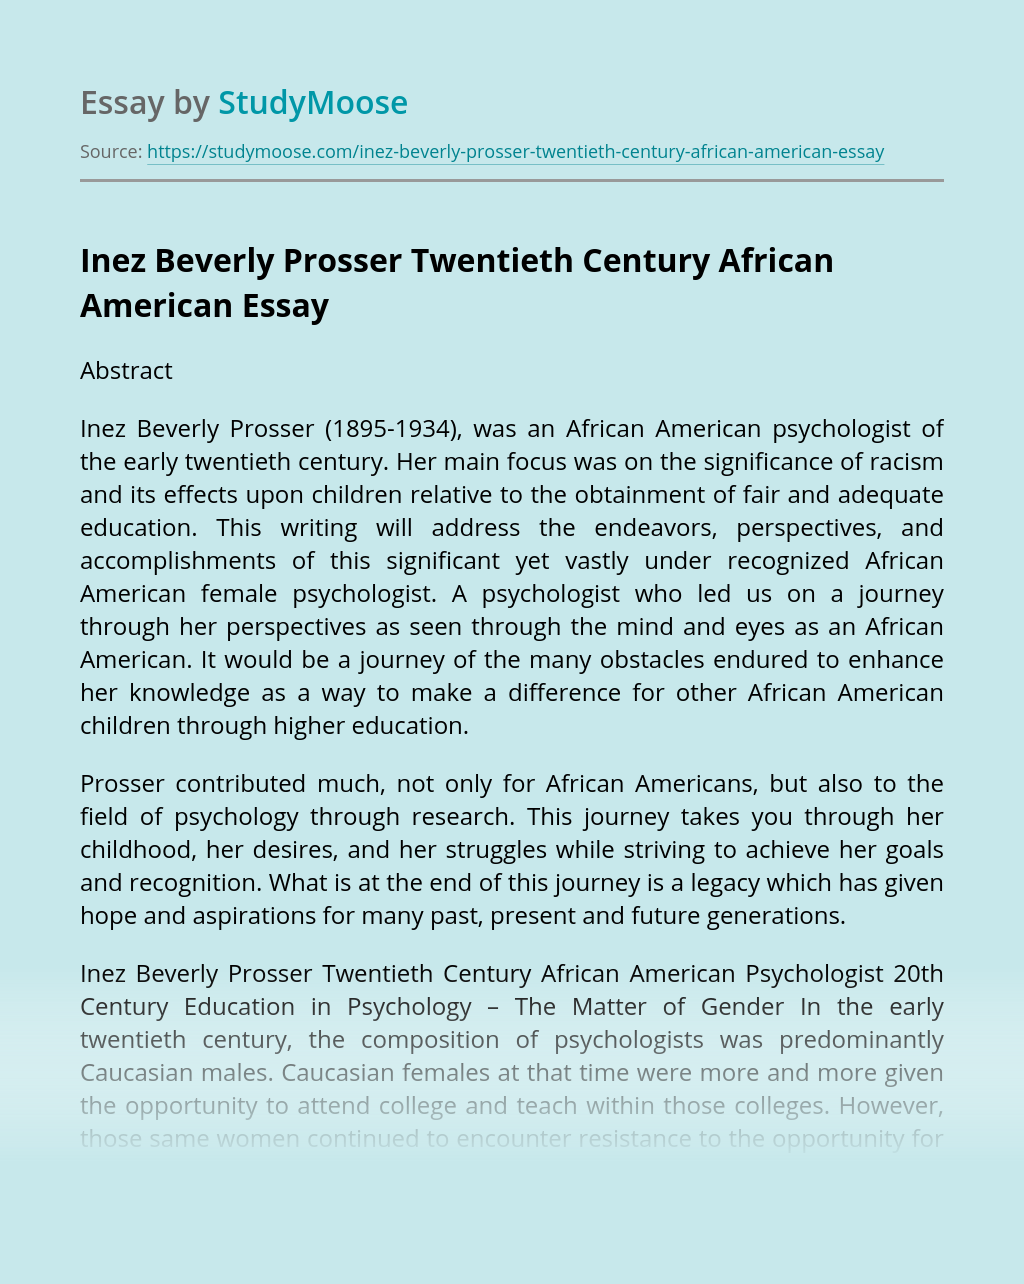 Inez Beverly Prosser Twentieth Century African American